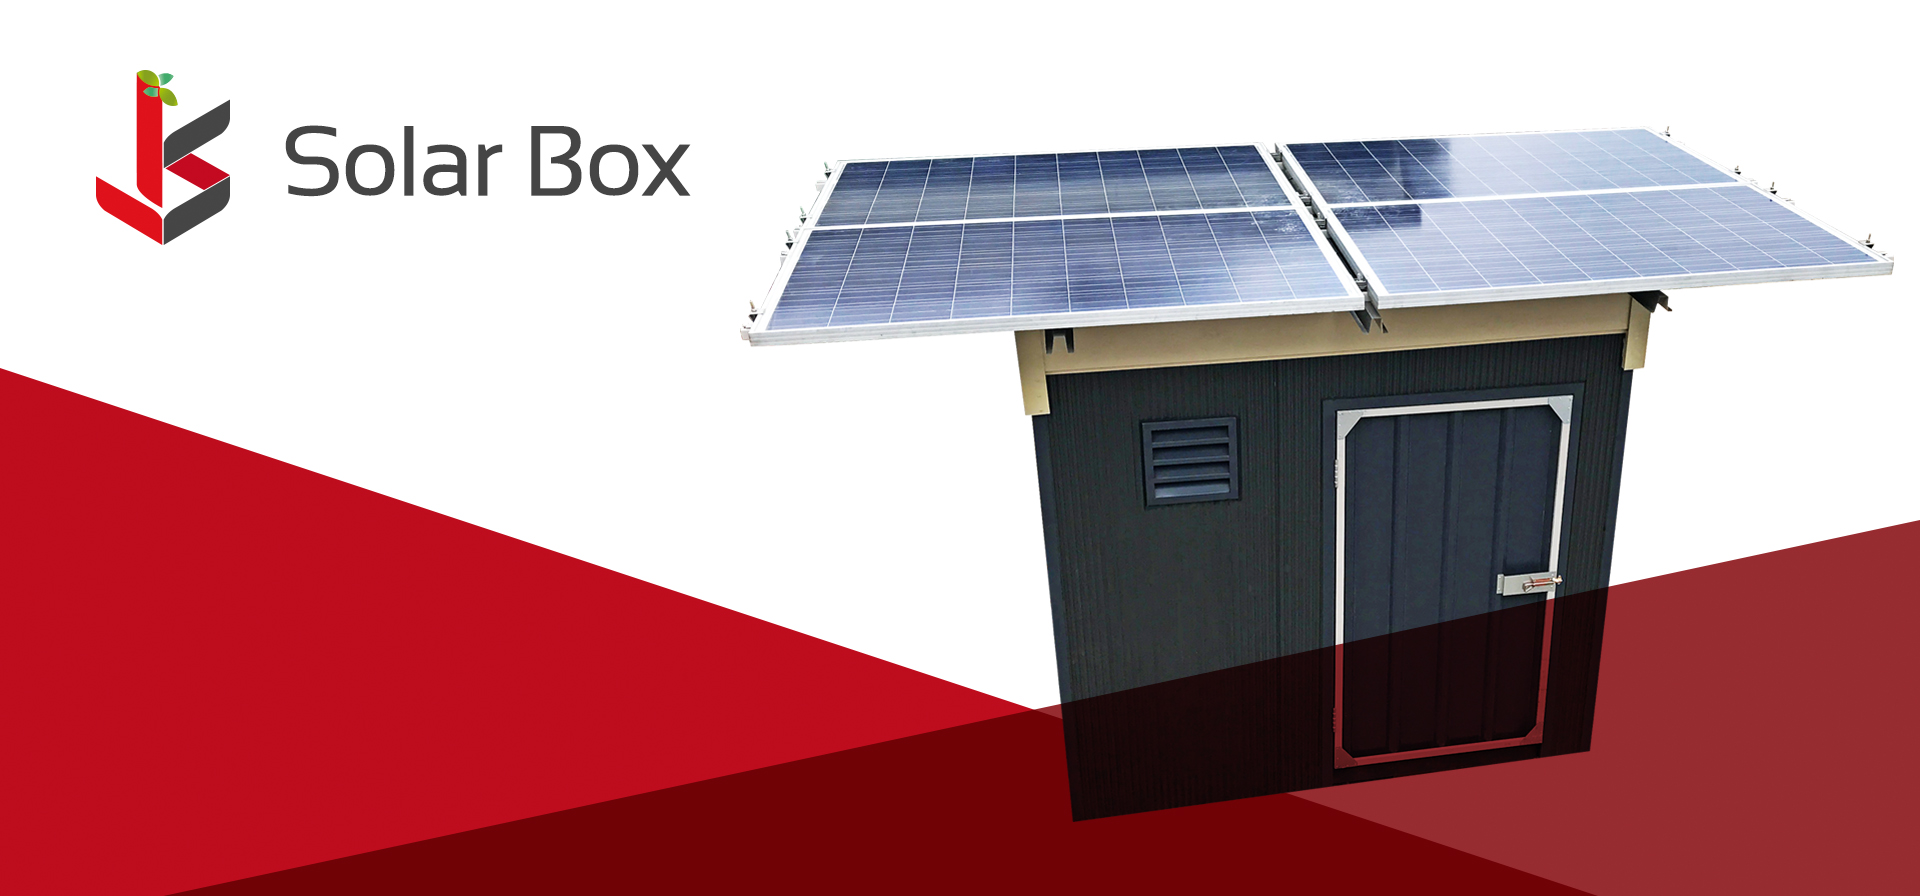 Kstr Solar Box Panel Diagram Overview